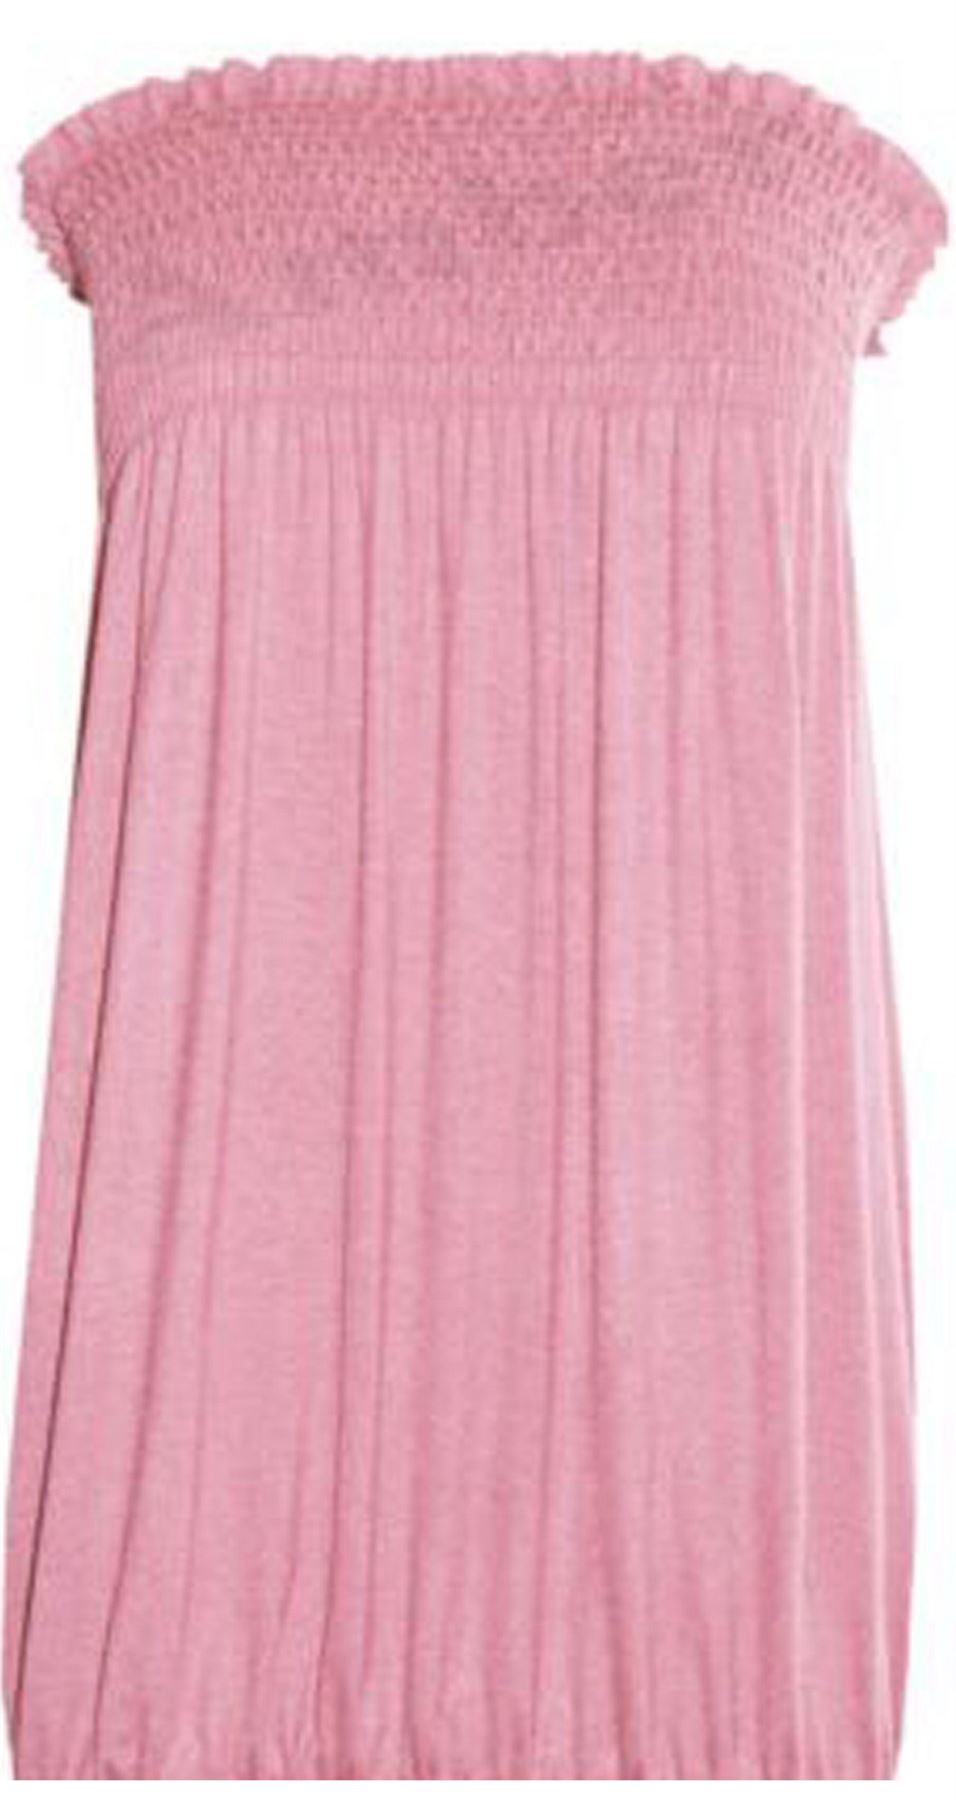 New-Ladies-Bandeau-Boob-Gathering-Tops-Boob-Tube-Beach-Wear-Tunics-8-26 thumbnail 11